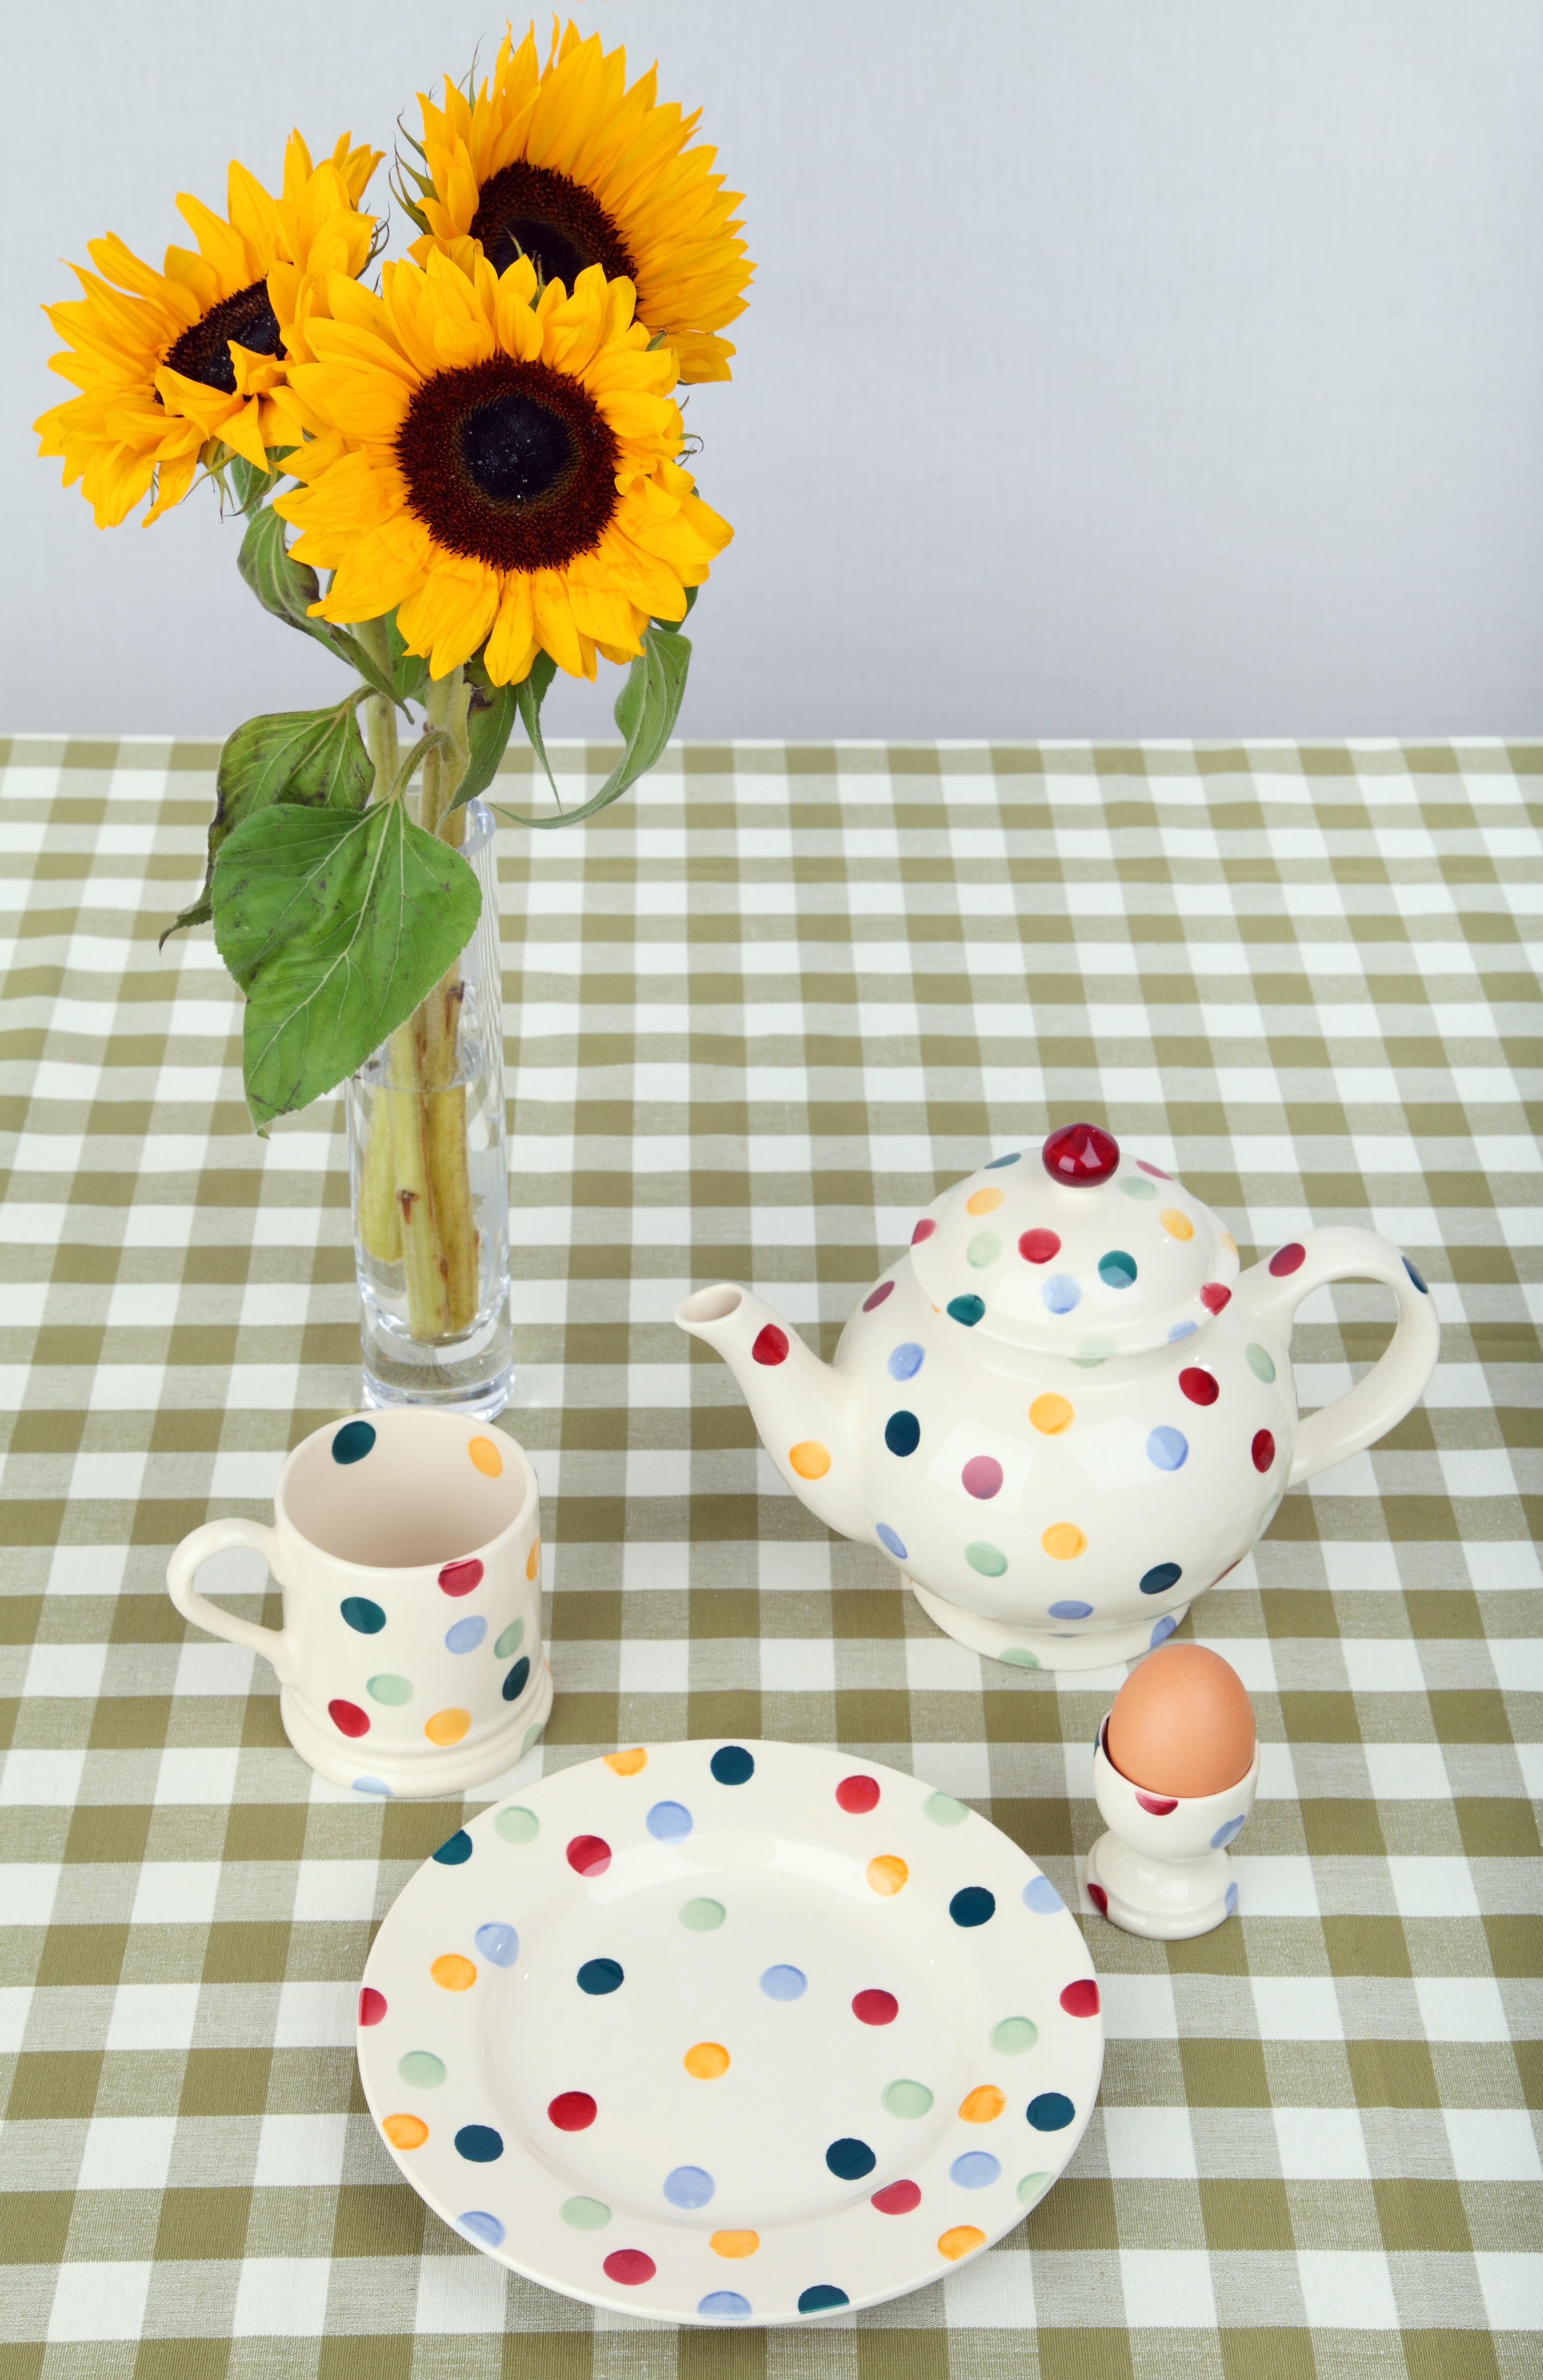 Kostenlose foto : Tabelle, Morgen, Blume, Blütenblatt, Tasse, Vase ...